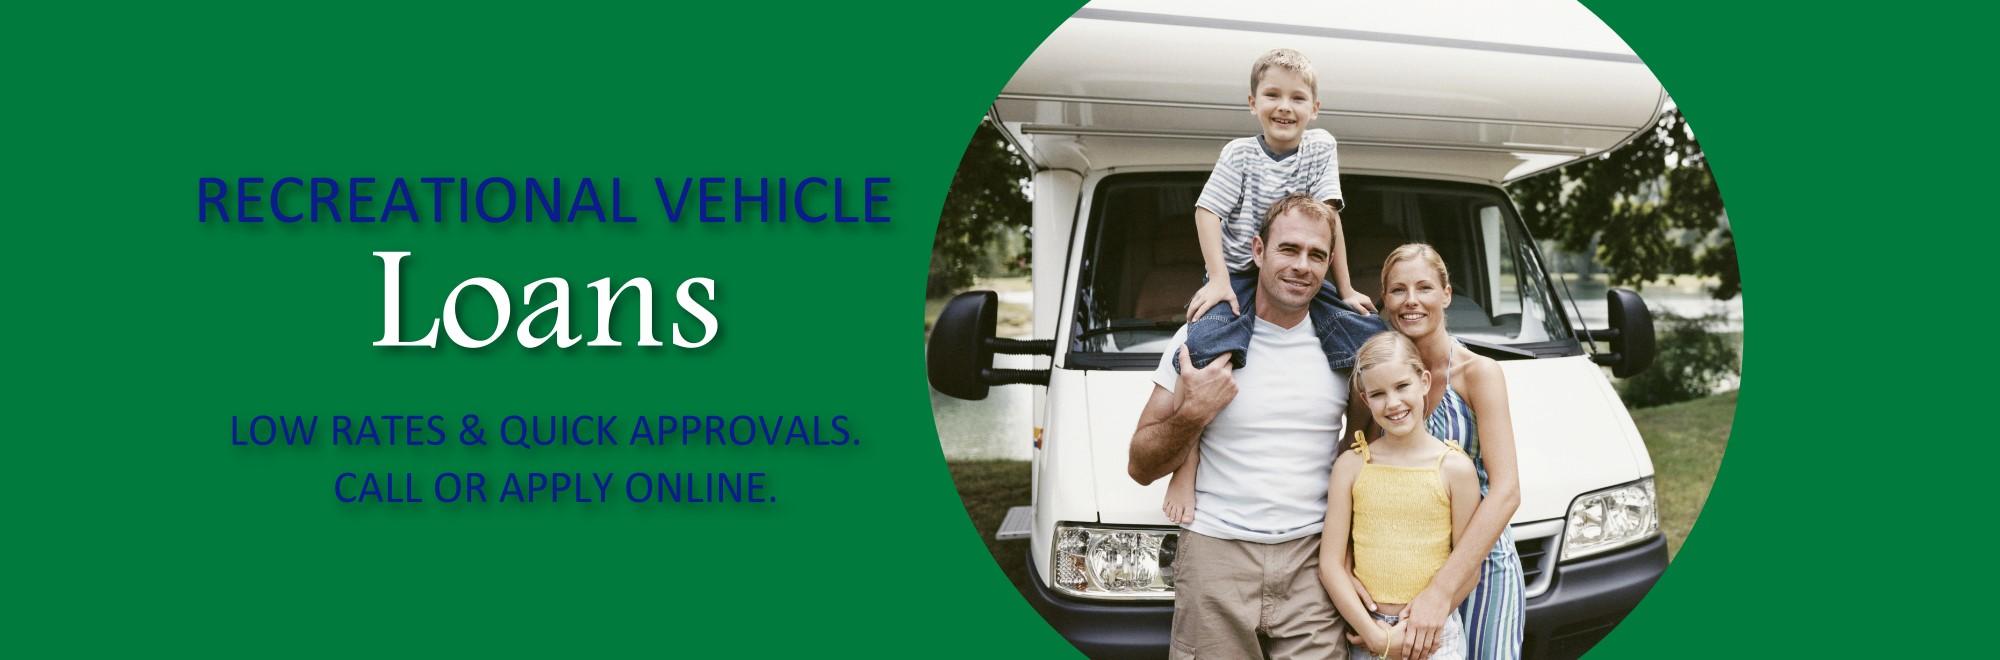 Recreational vehicle loan image